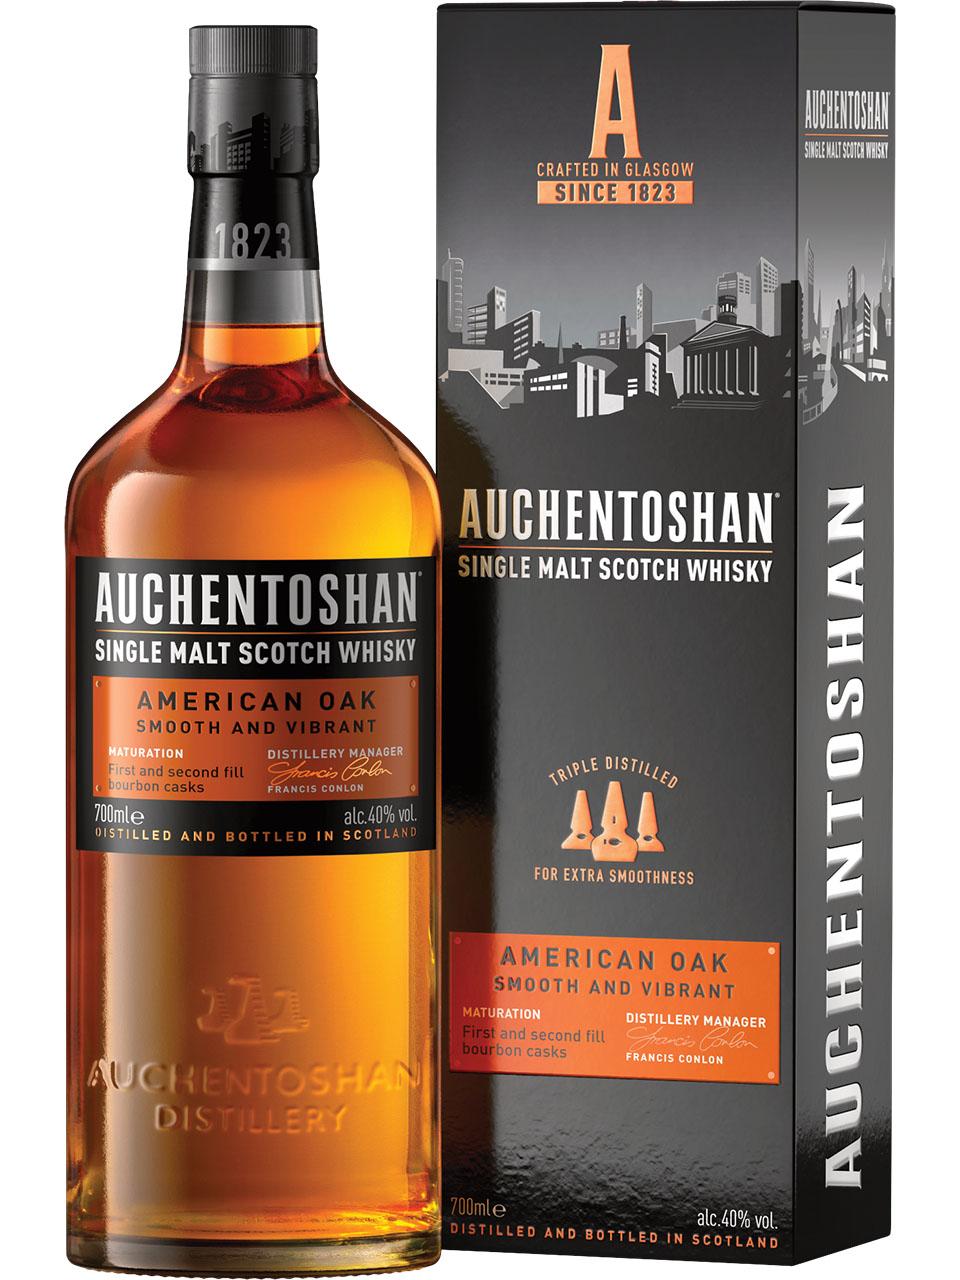 Auchentoshan American Oak Single Malt Scotch Whisk